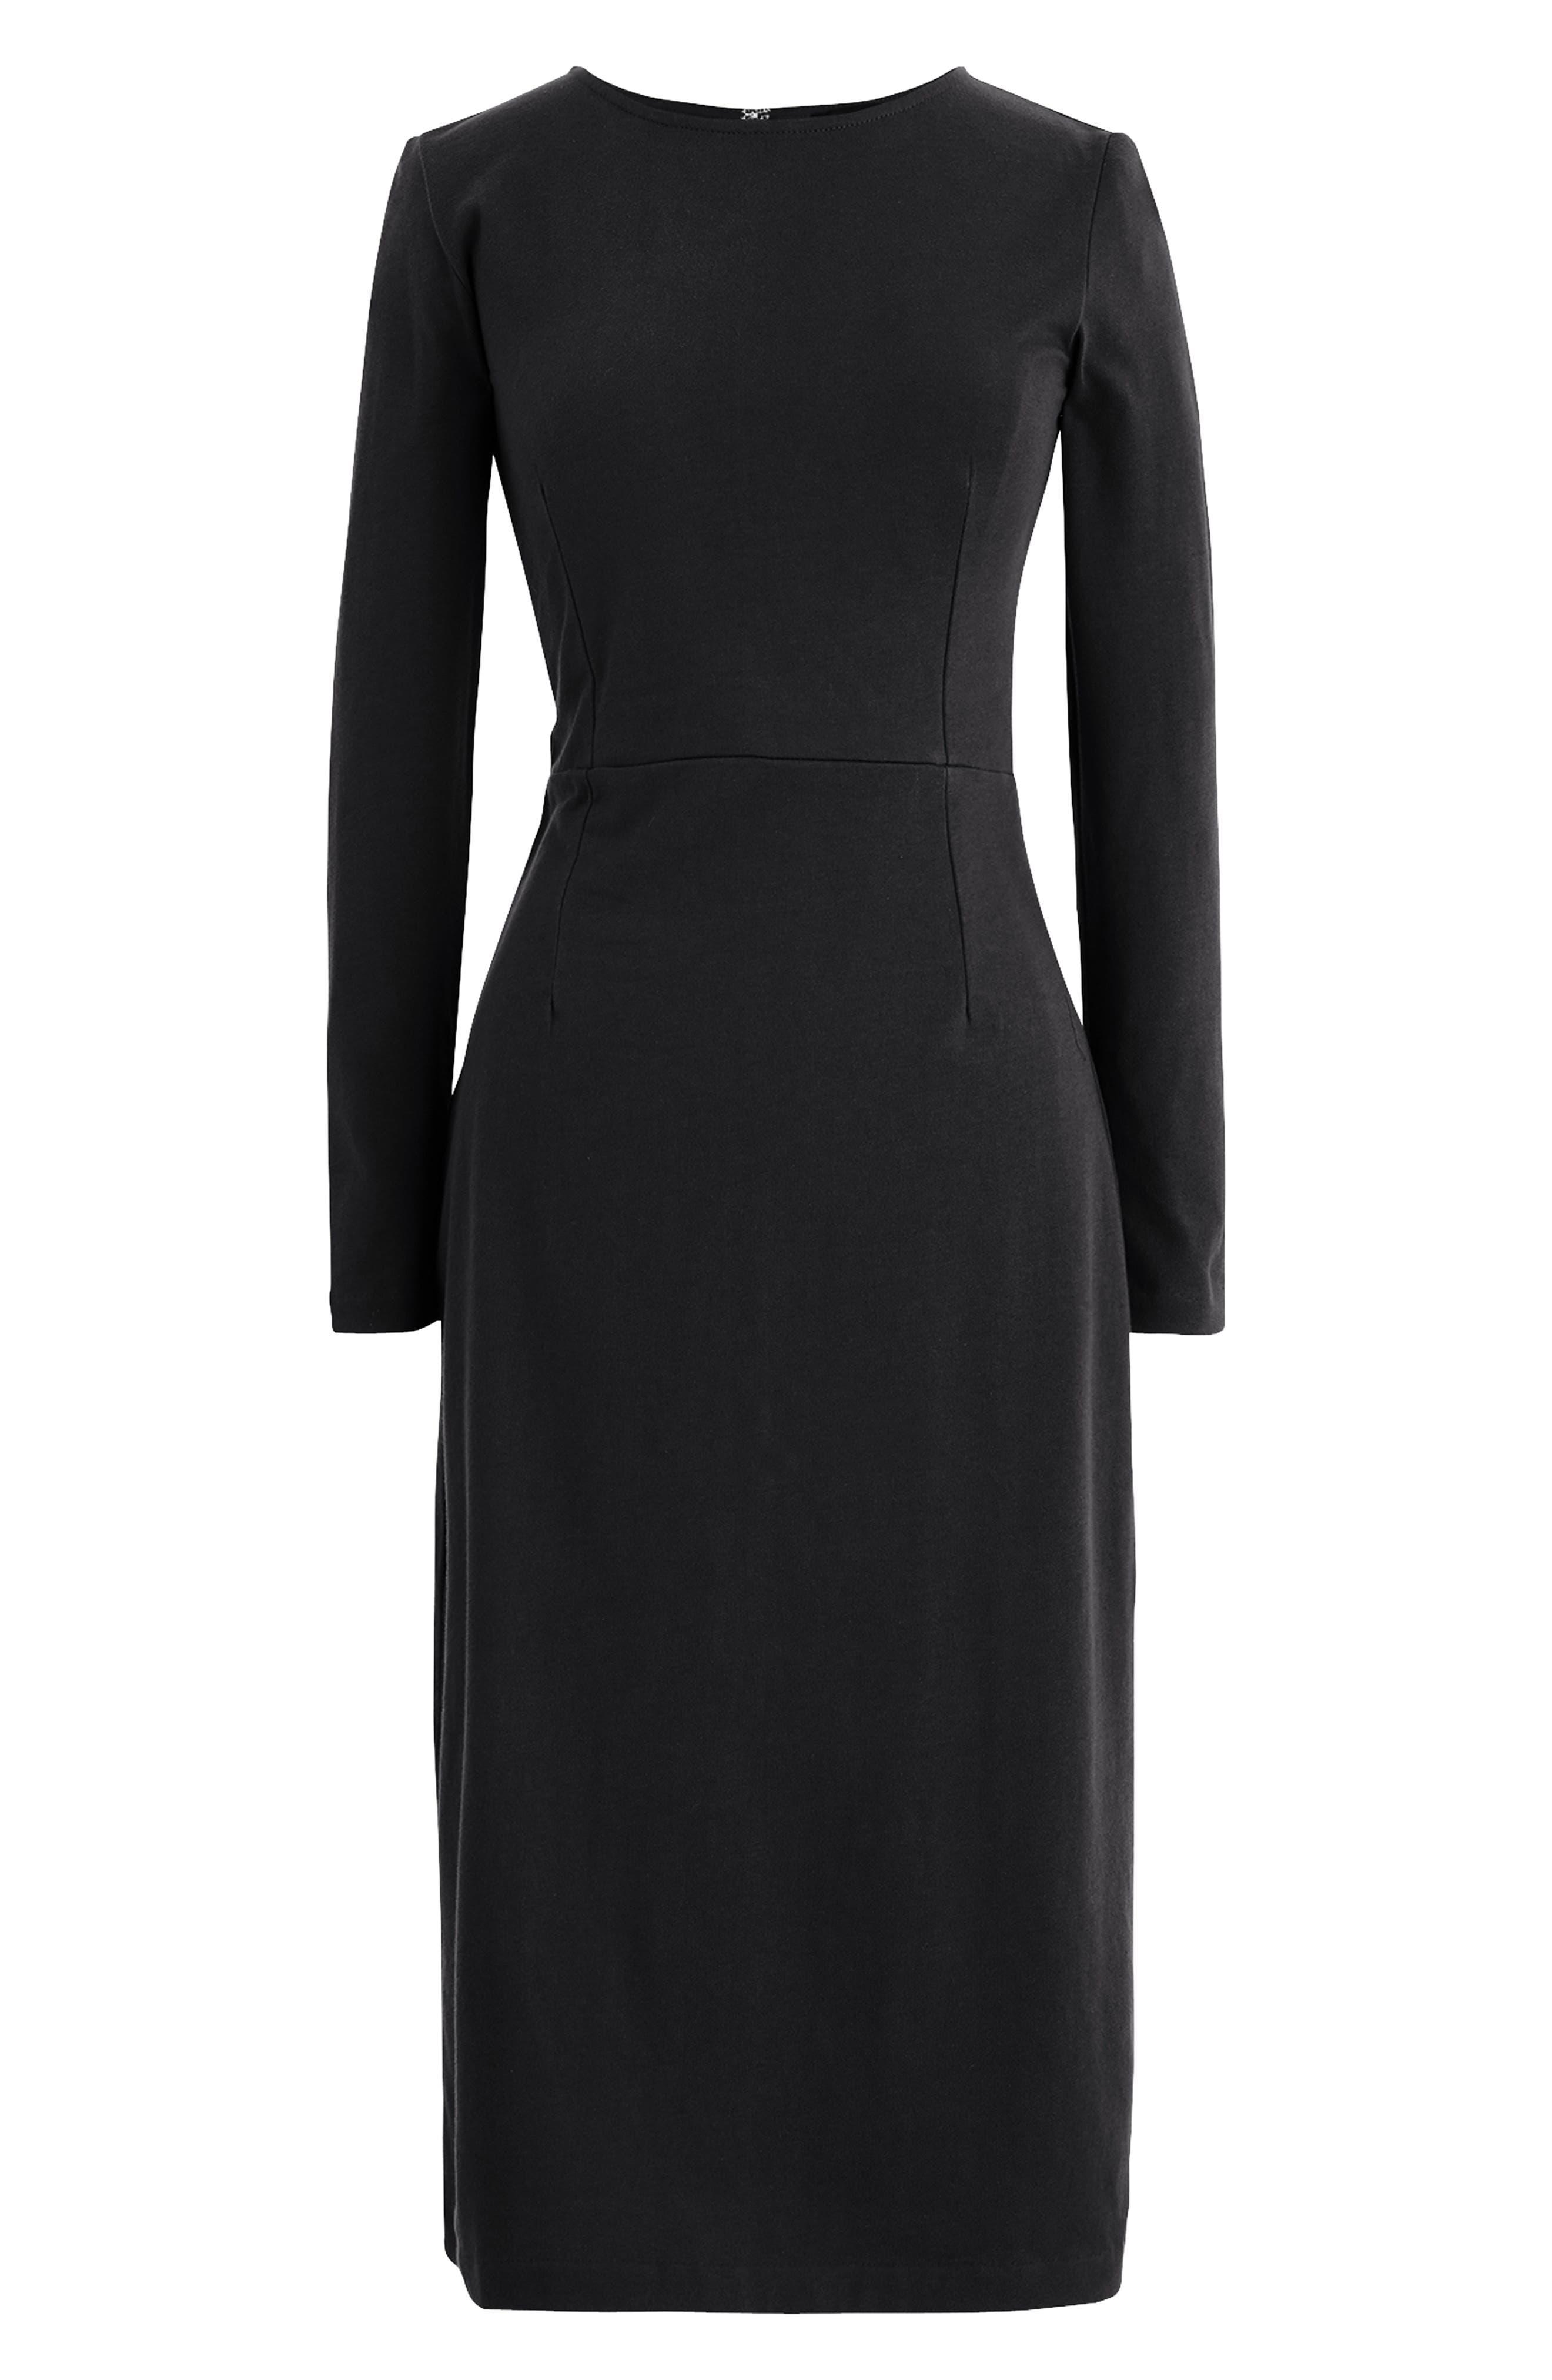 J.CREW Knit Sheath Dress, Main, color, BLACK